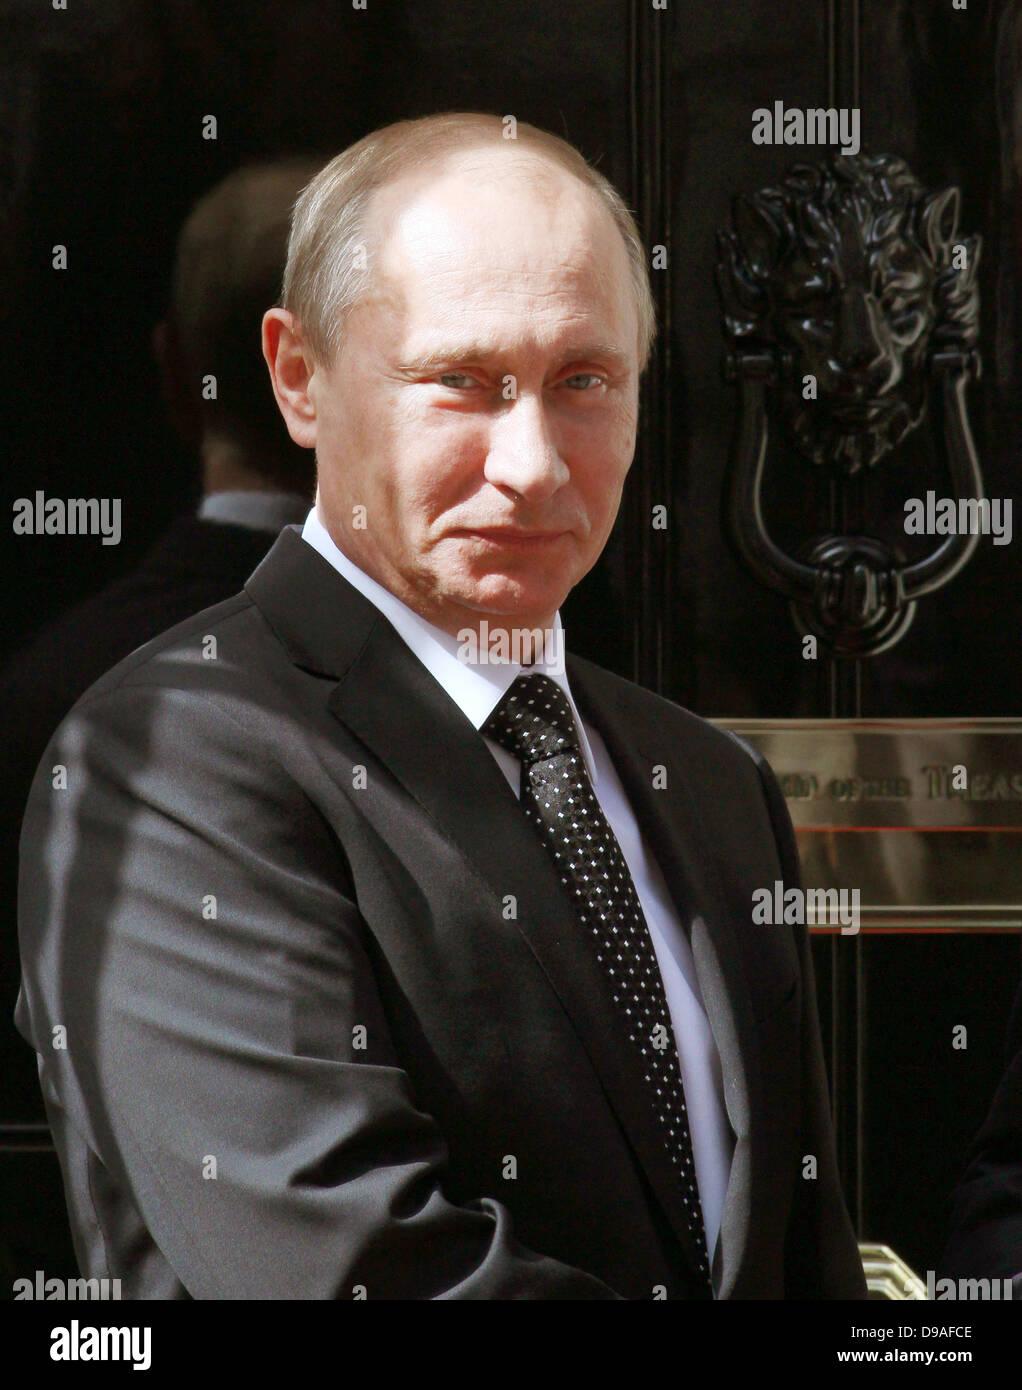 VLADIMIR PUTIN RUSSIAN PRESIDENT 16 June 2013 10 DOWNING STREET  LONDON ENGLAND Stock Photo